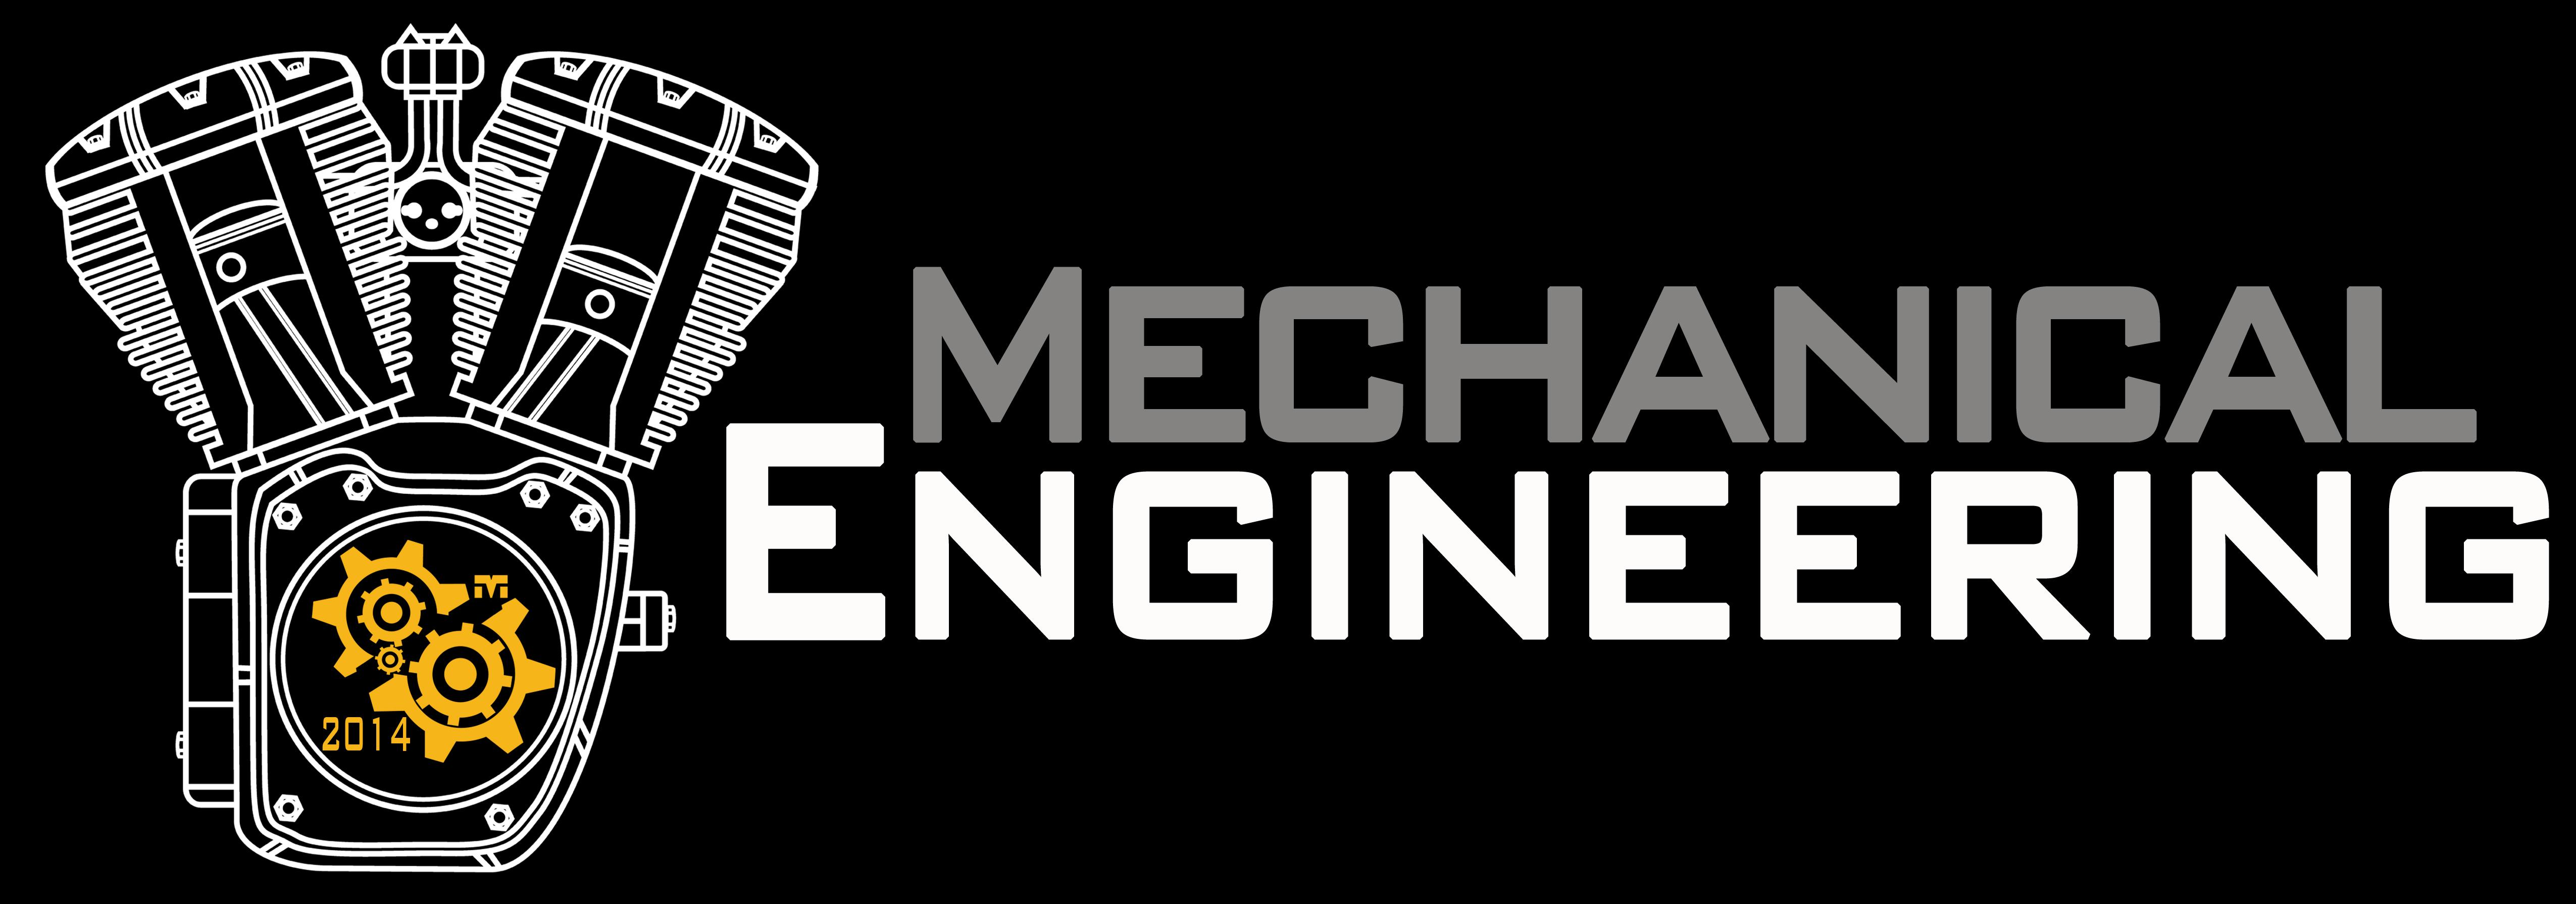 Aerospace Engineering and Engineering Mechanics